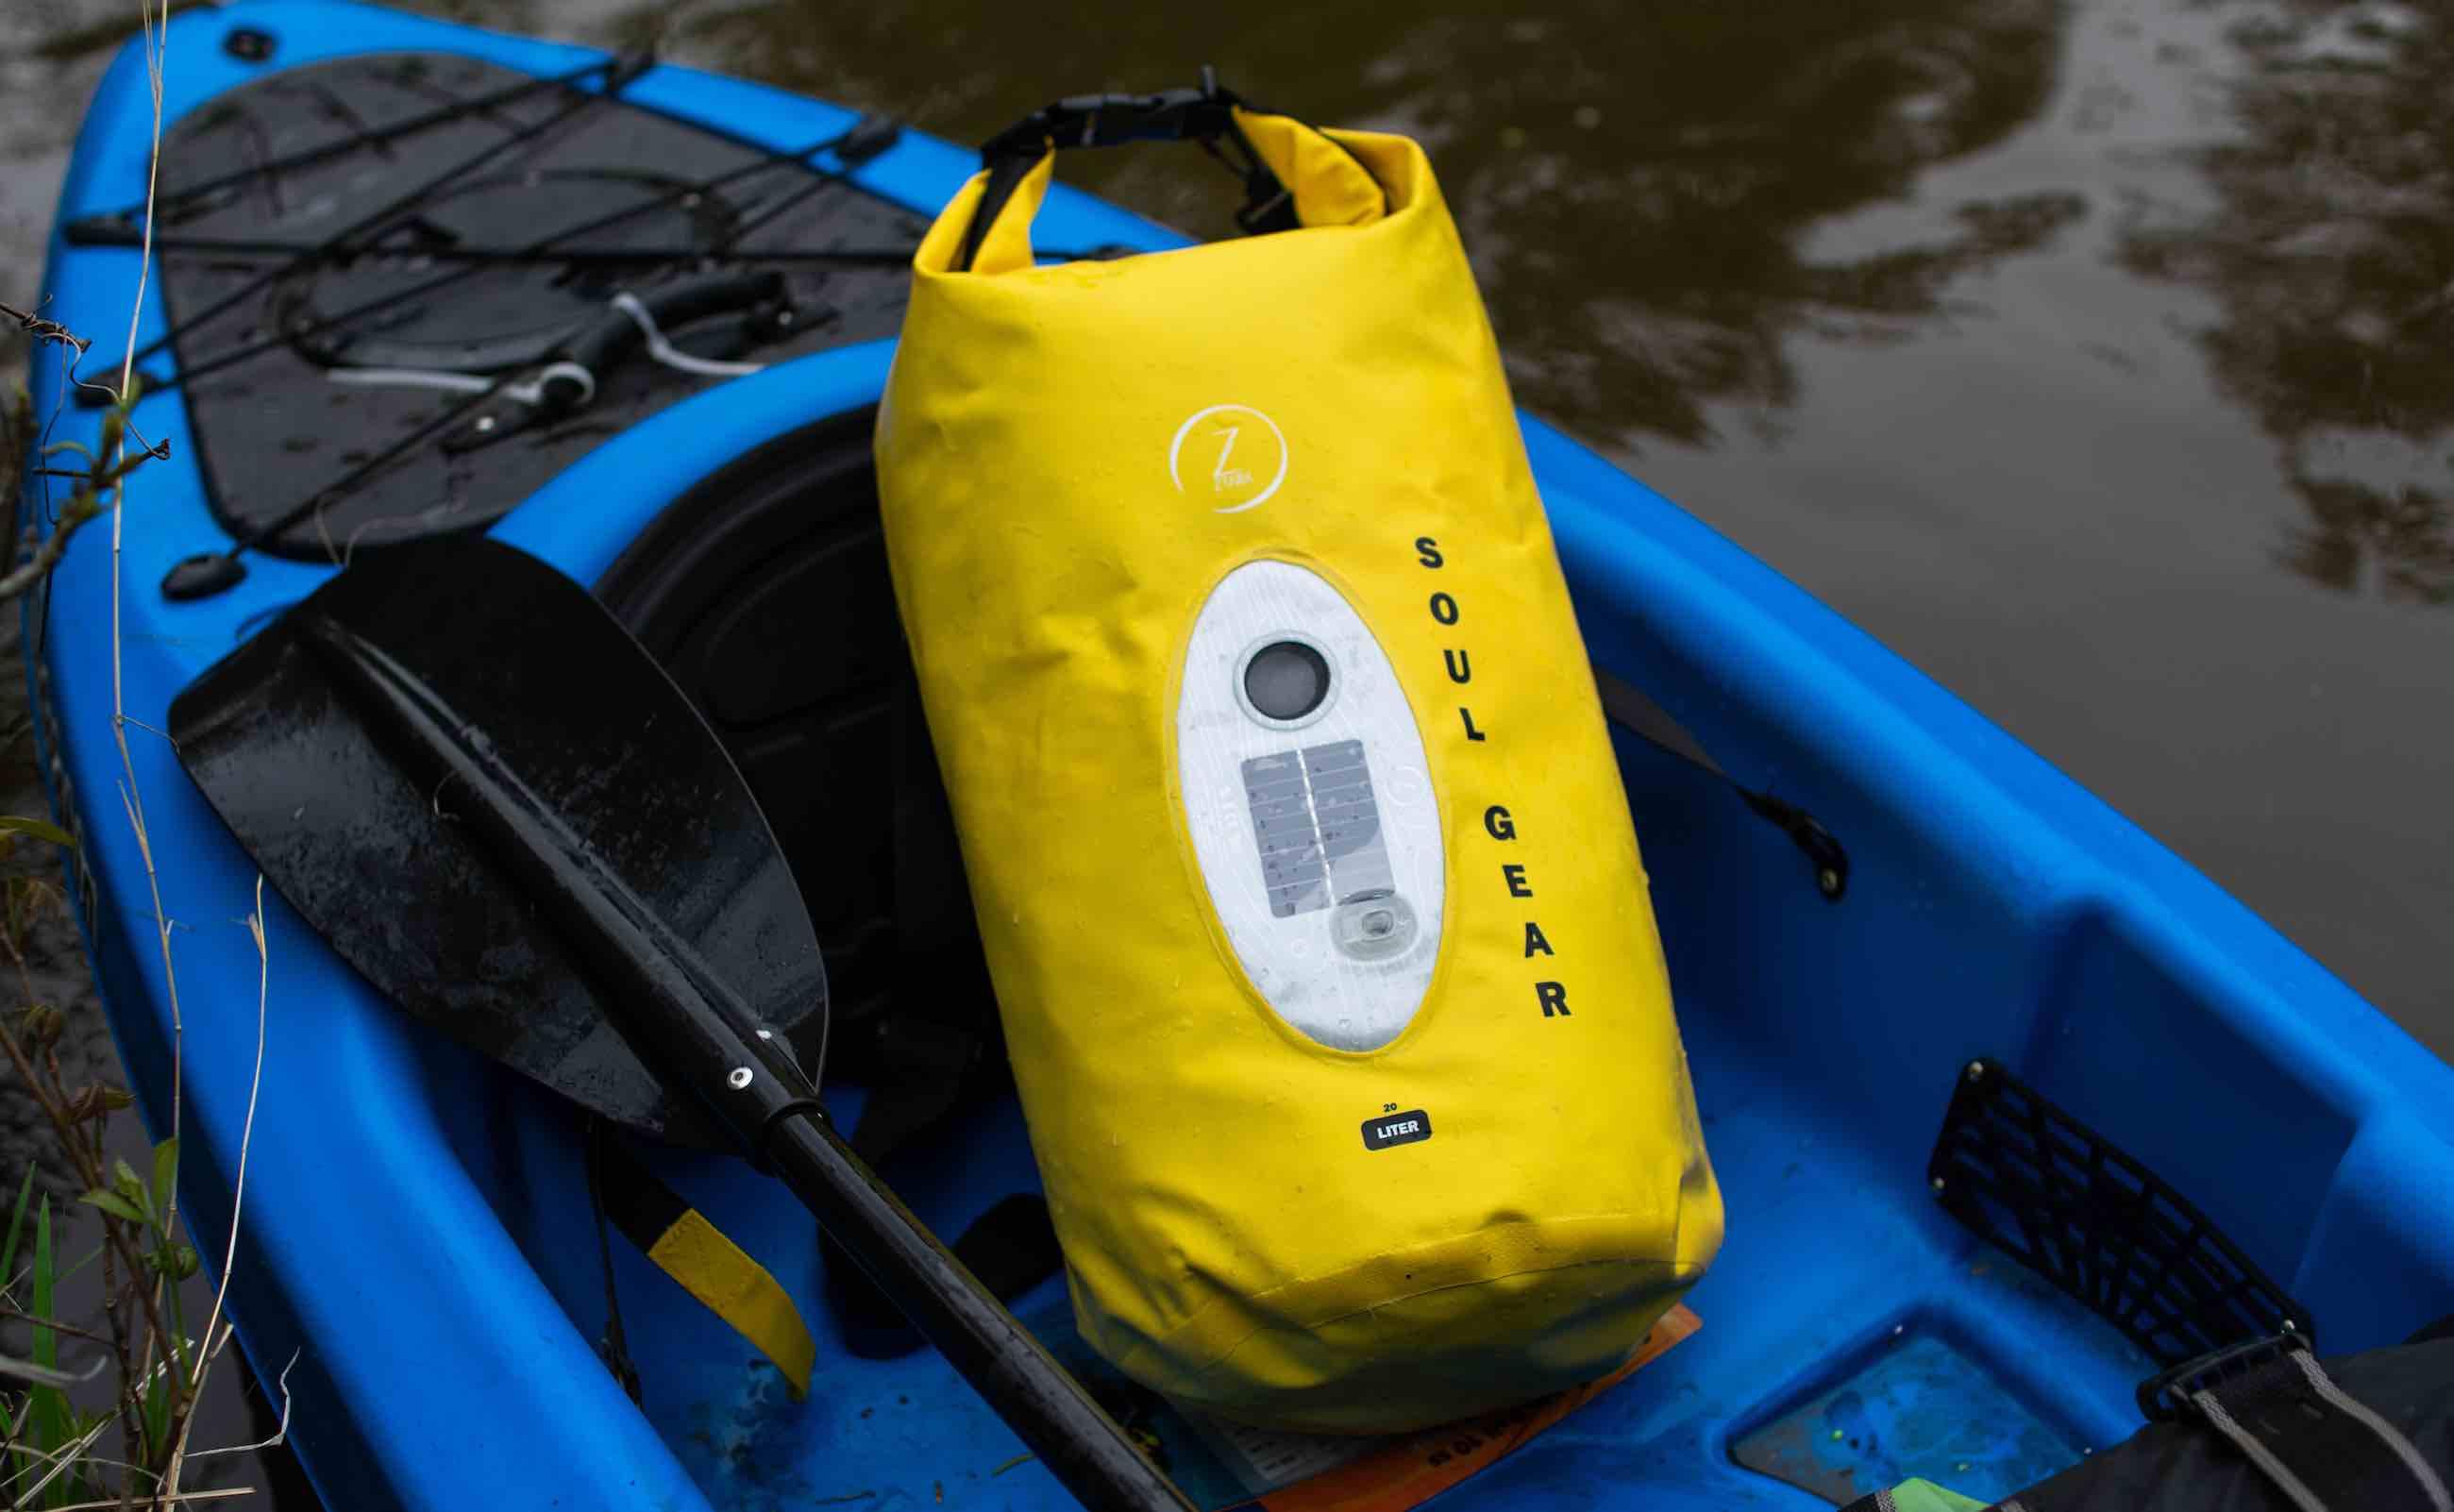 SOUL GEAR Waterproof Dry Bag Speaker combines two must-haves in one